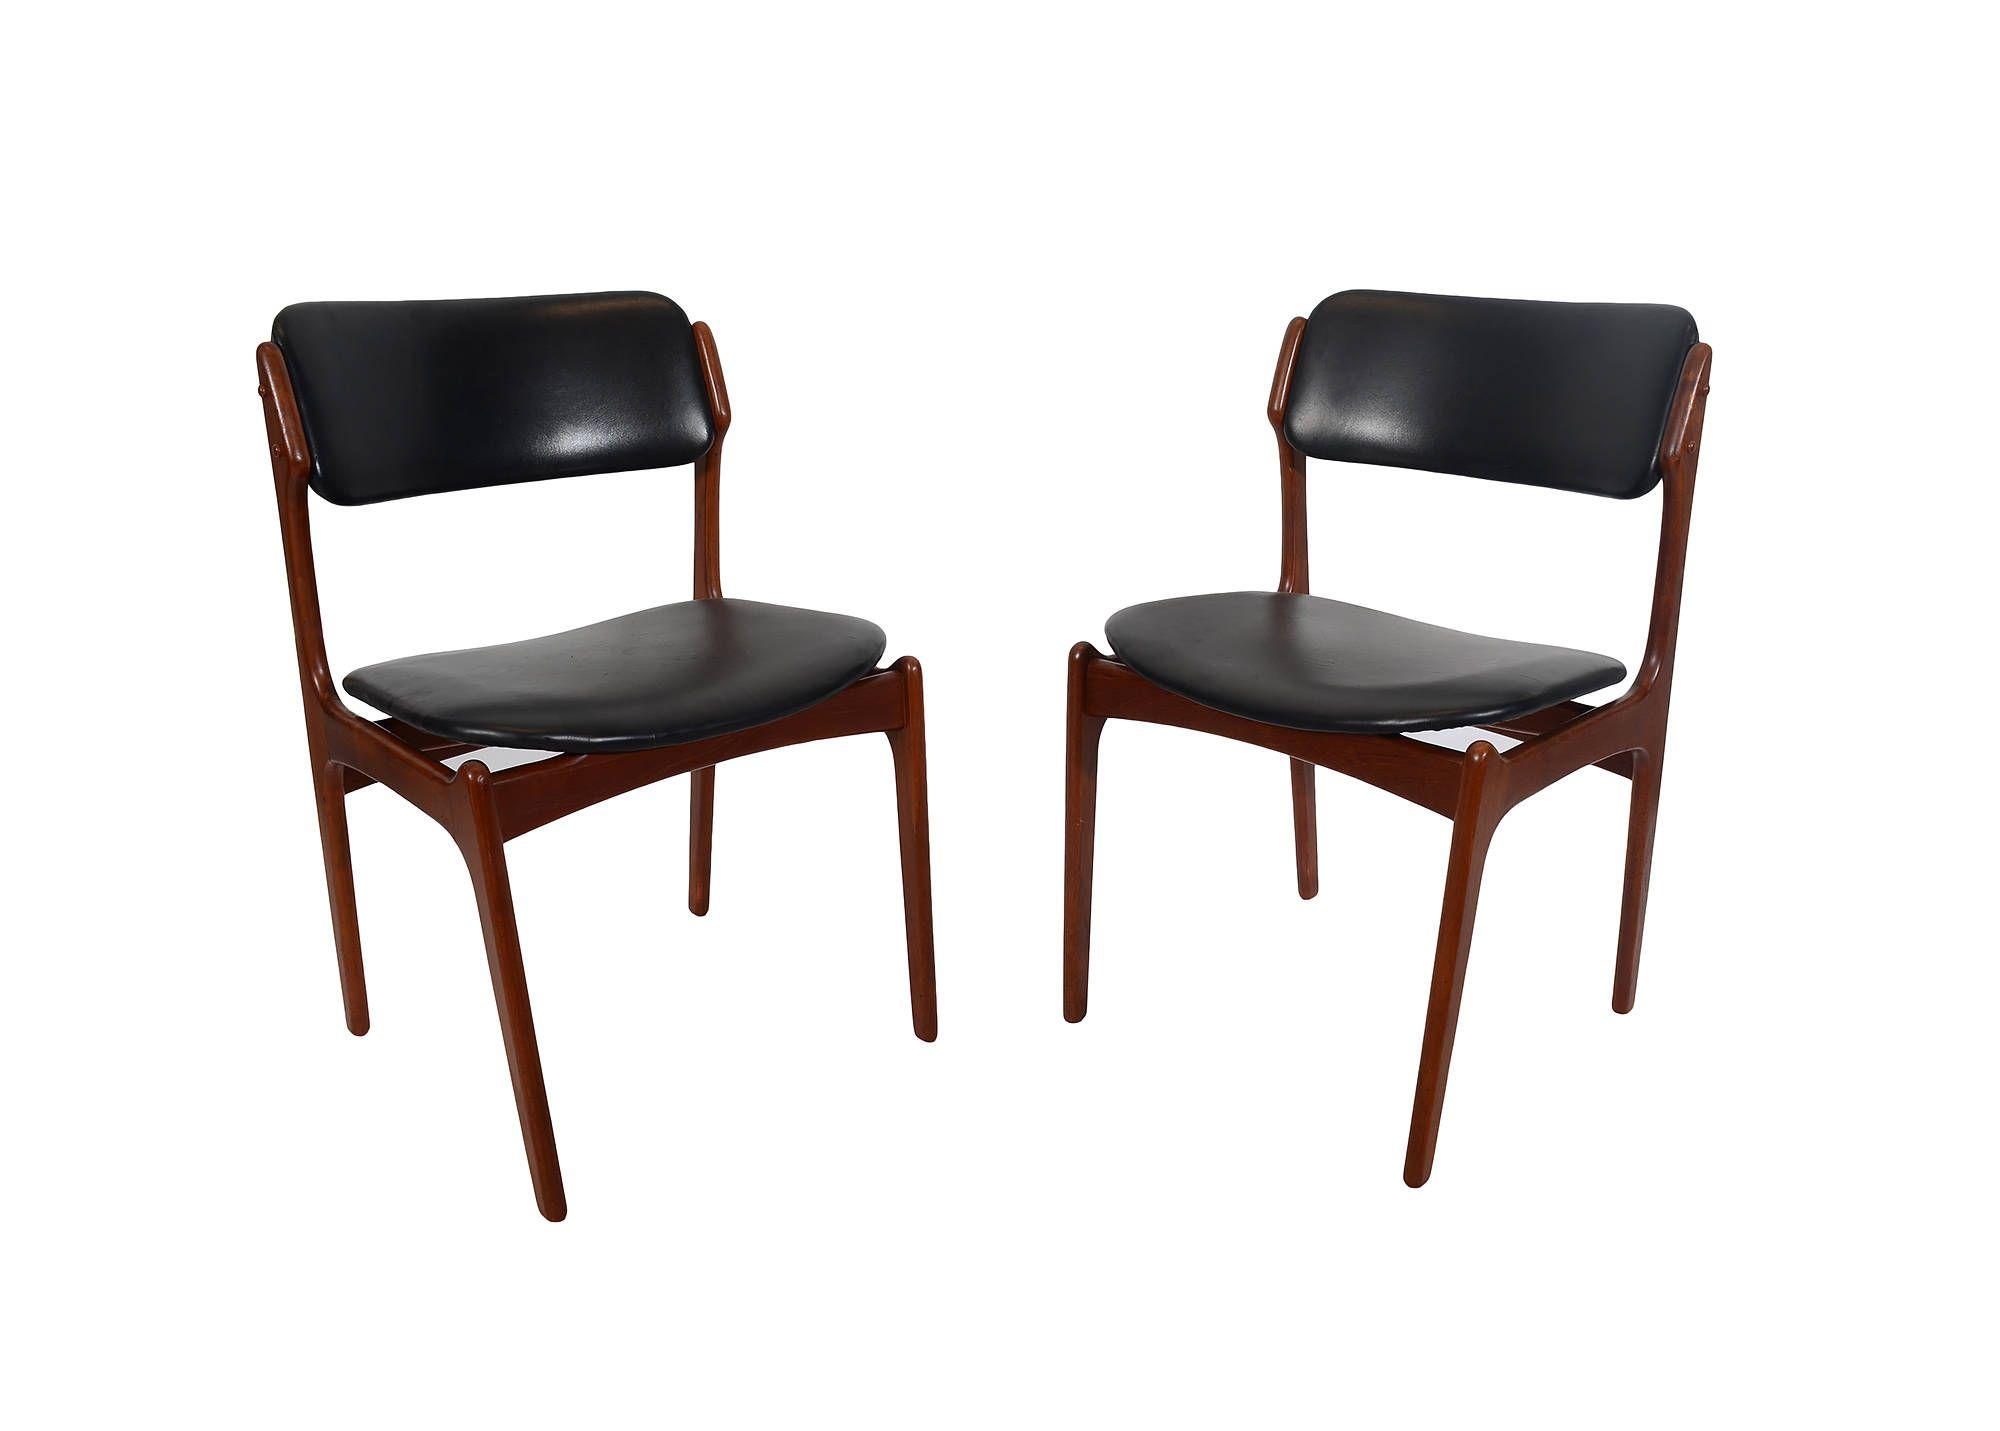 6 teak dining chairs erik buch danish modern od mobler model 49